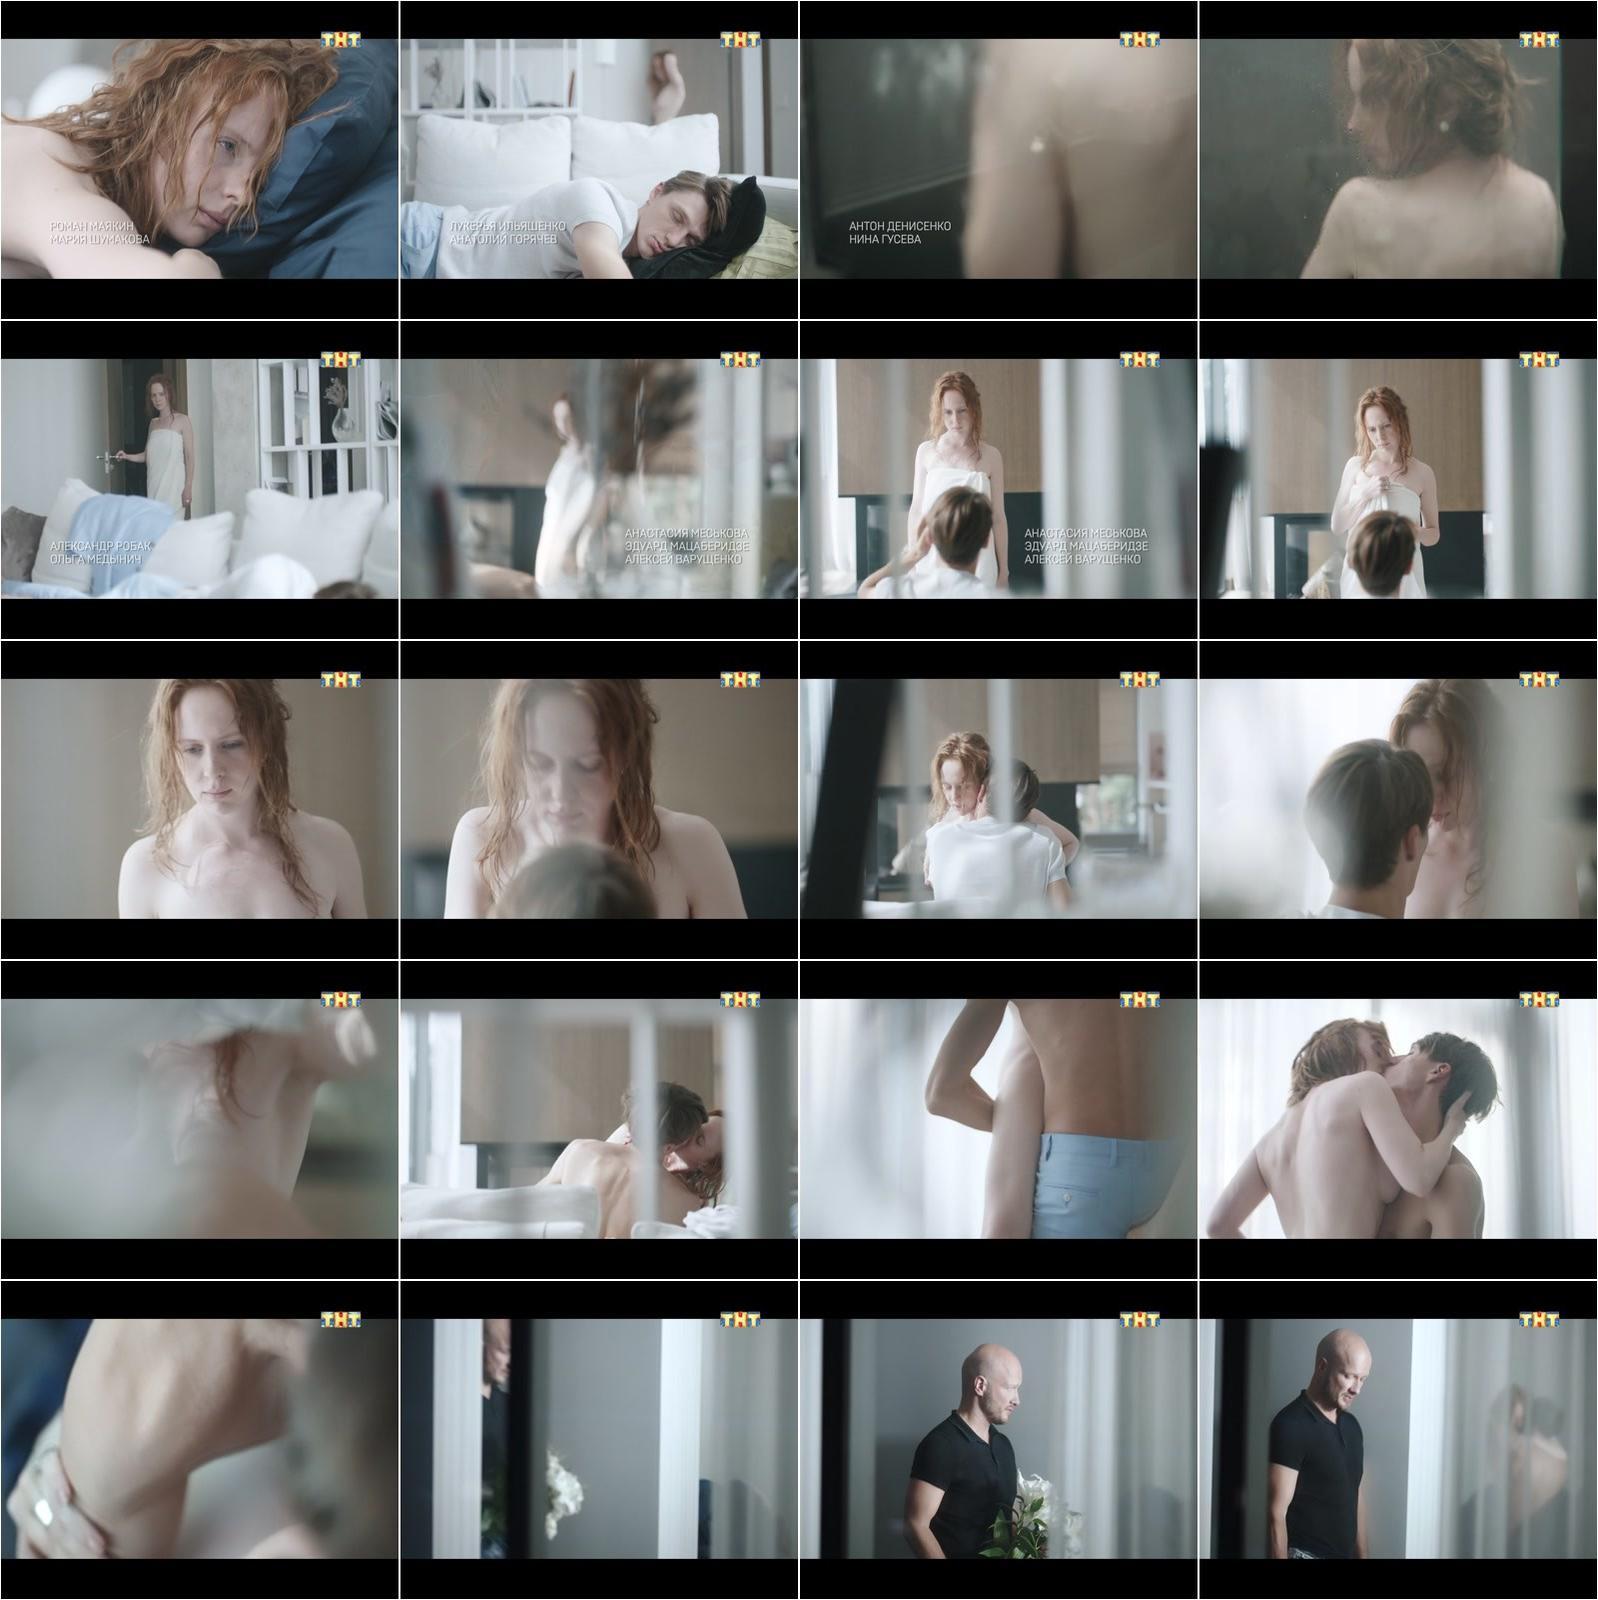 Darya_Belousova nude - Sladkaya zhizn s03e06 (2016)